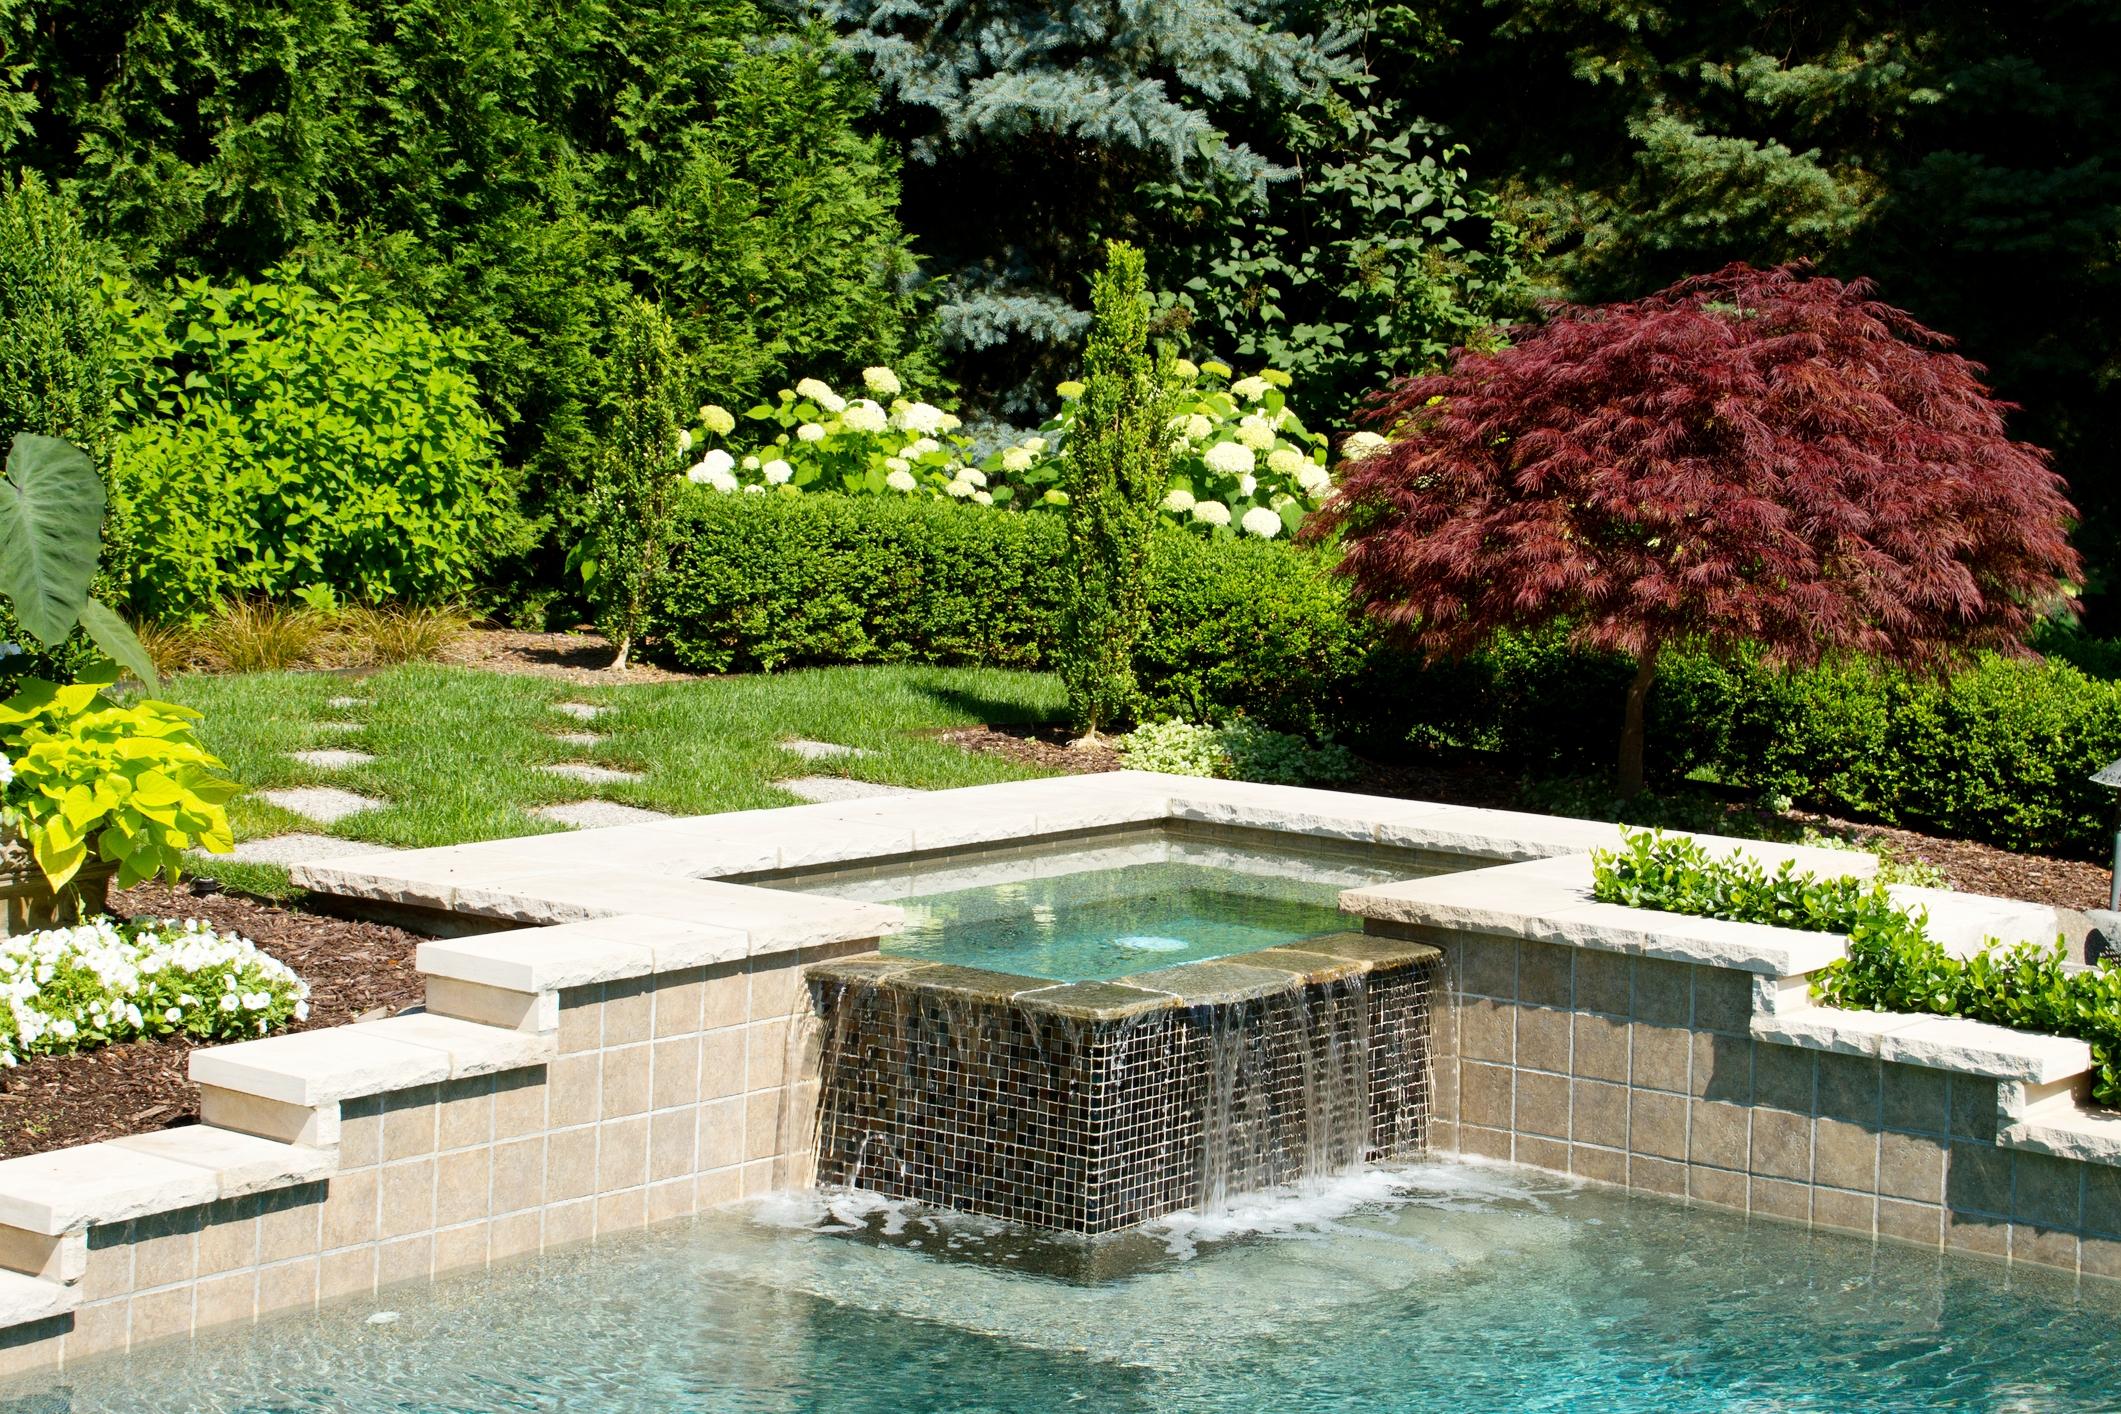 london-ontario-landscaper-pool-pond-design-garden-company-hunter-home-garden-09.jpg